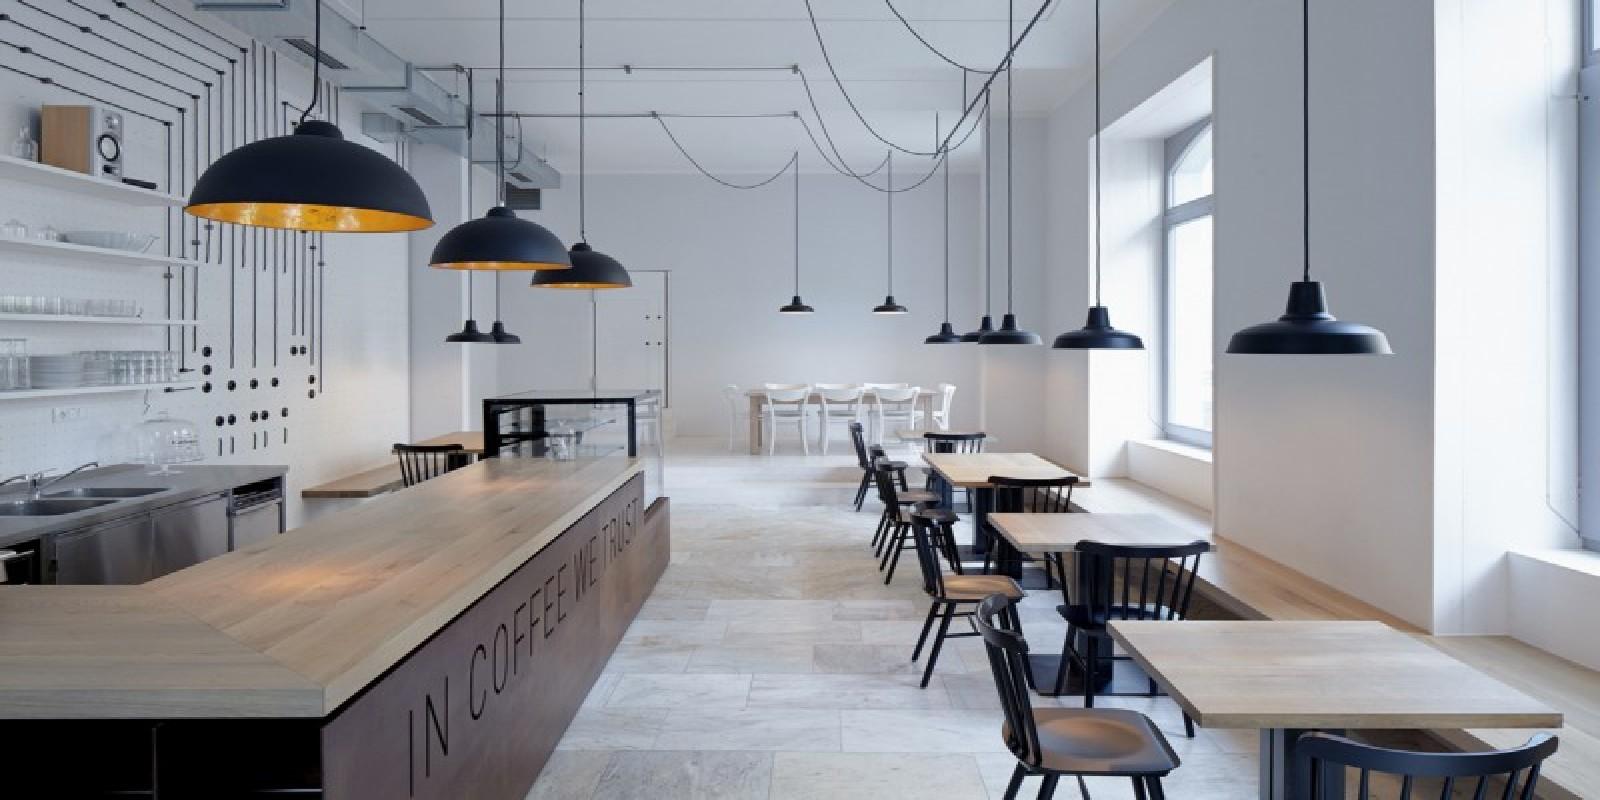 Bistro Proti Proudu by Mimosa Architekti | Floornature